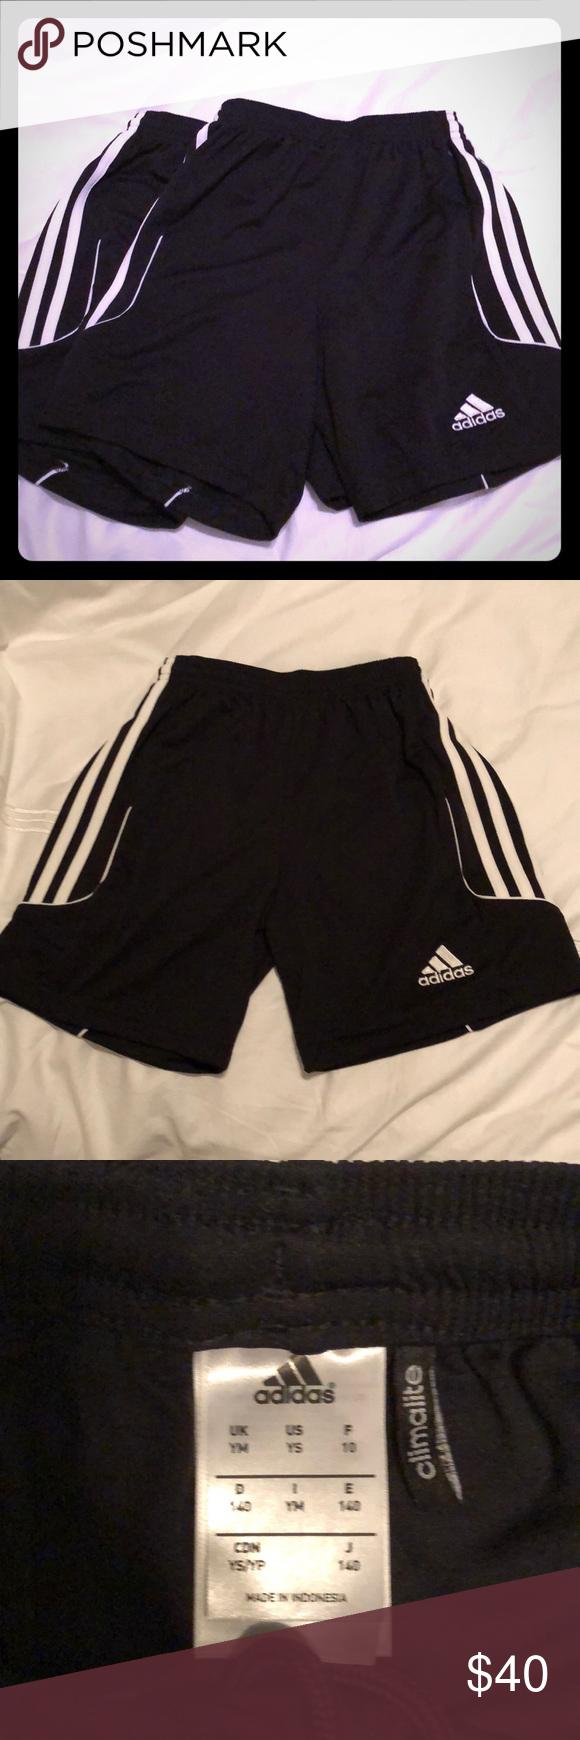 Adidas soccer shorts worn once pair pair if adidas soccer